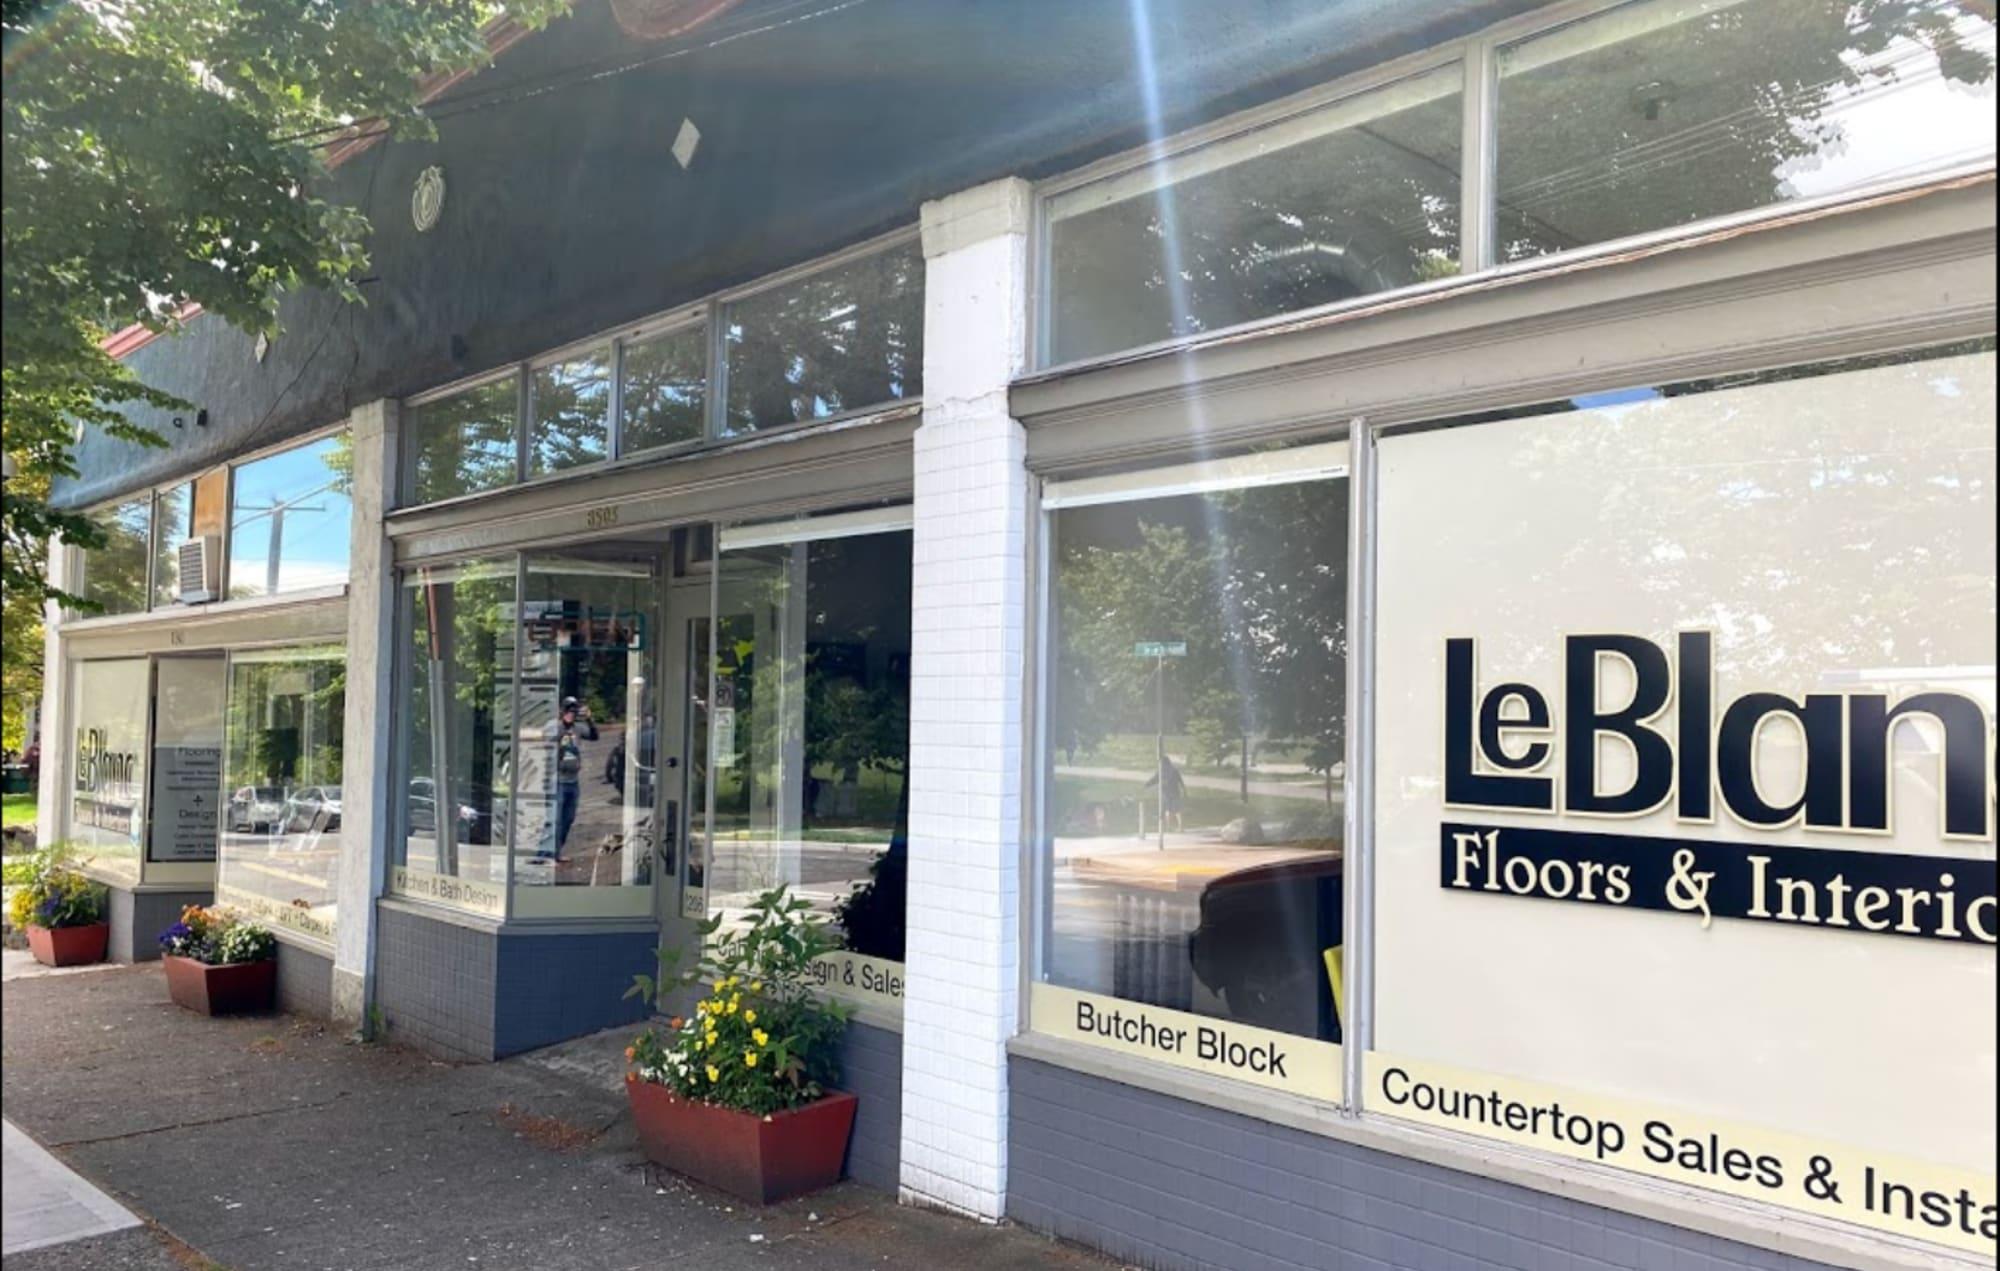 LeBlanc Floors & Interiors - 8501 Roosevelt Way NE Seattle, WA 98115